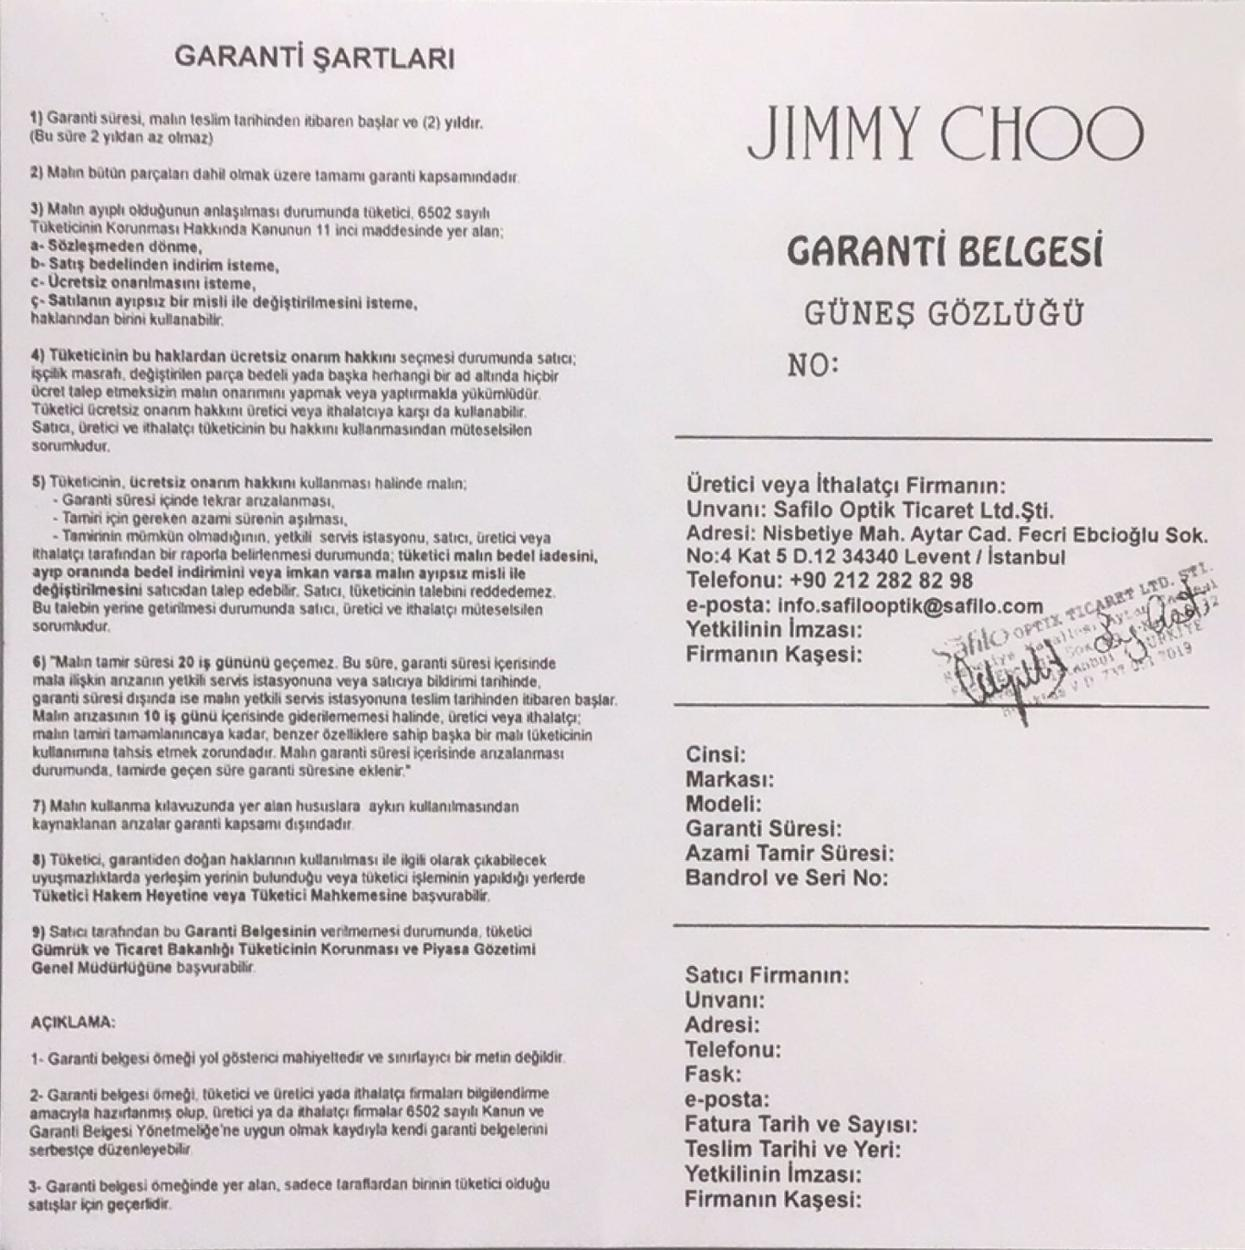 Jimmy Choo Gözlük